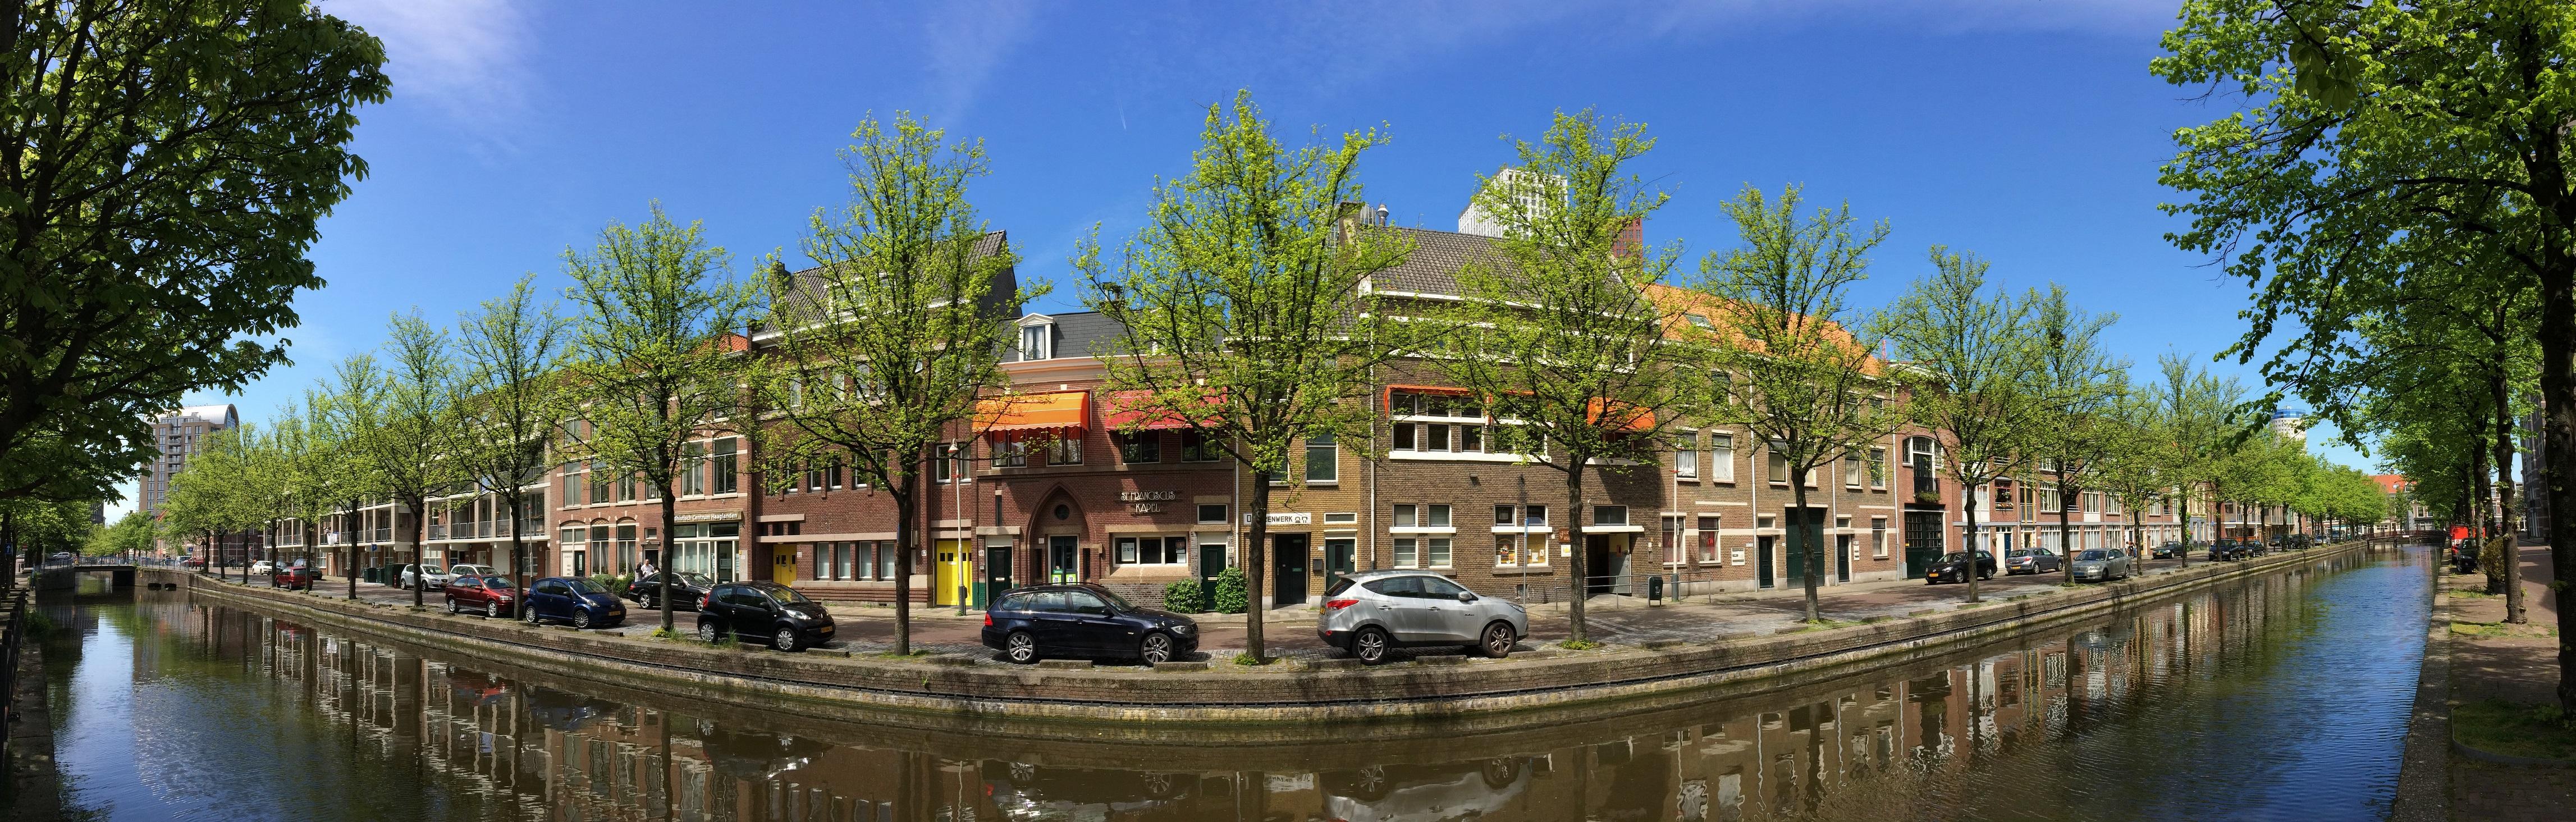 File Netherlands, The Hague (Den Haag), Uilebomen (2) jpg   Wikimedia Commons